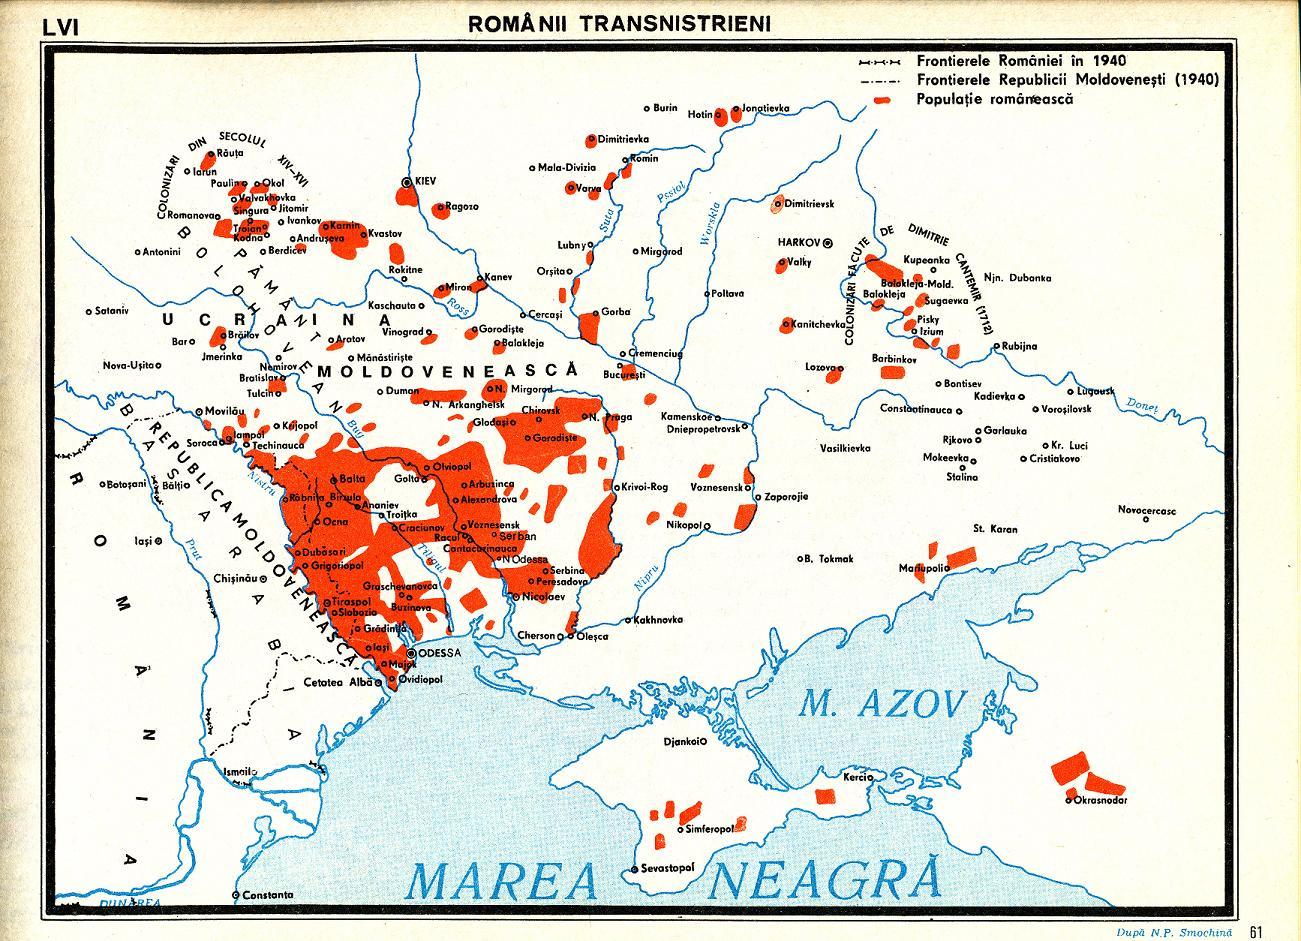 Romanii din Transnistria Harta Etnica Romania Mare Basarabia Pamant Romanesc.JPG